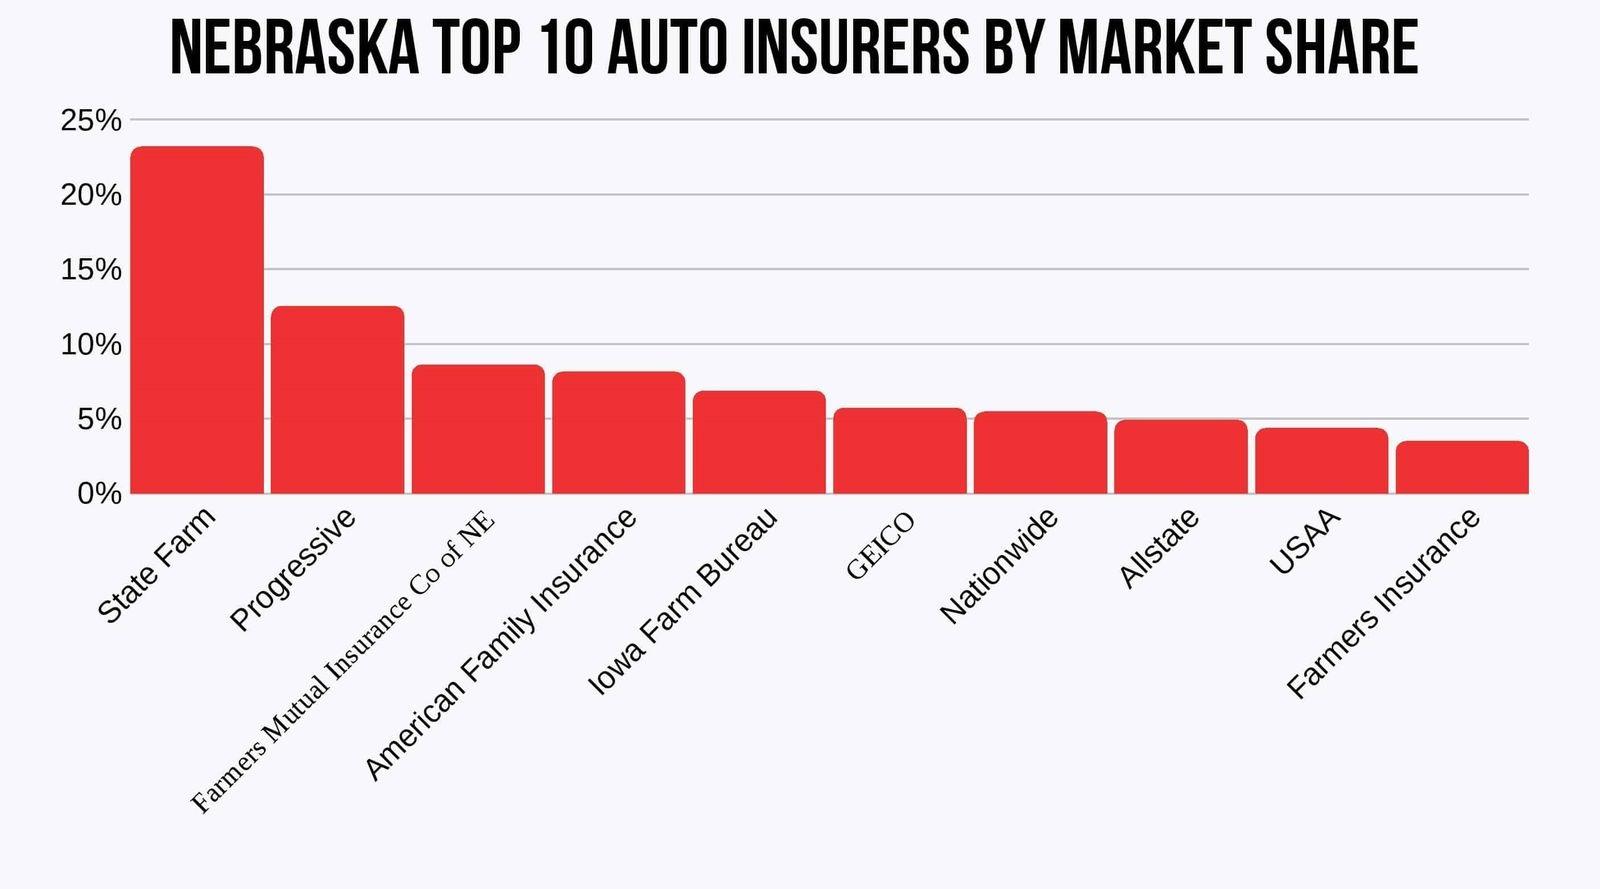 Nebraska-Top-10-Auto-Insurers-by-Market-Share